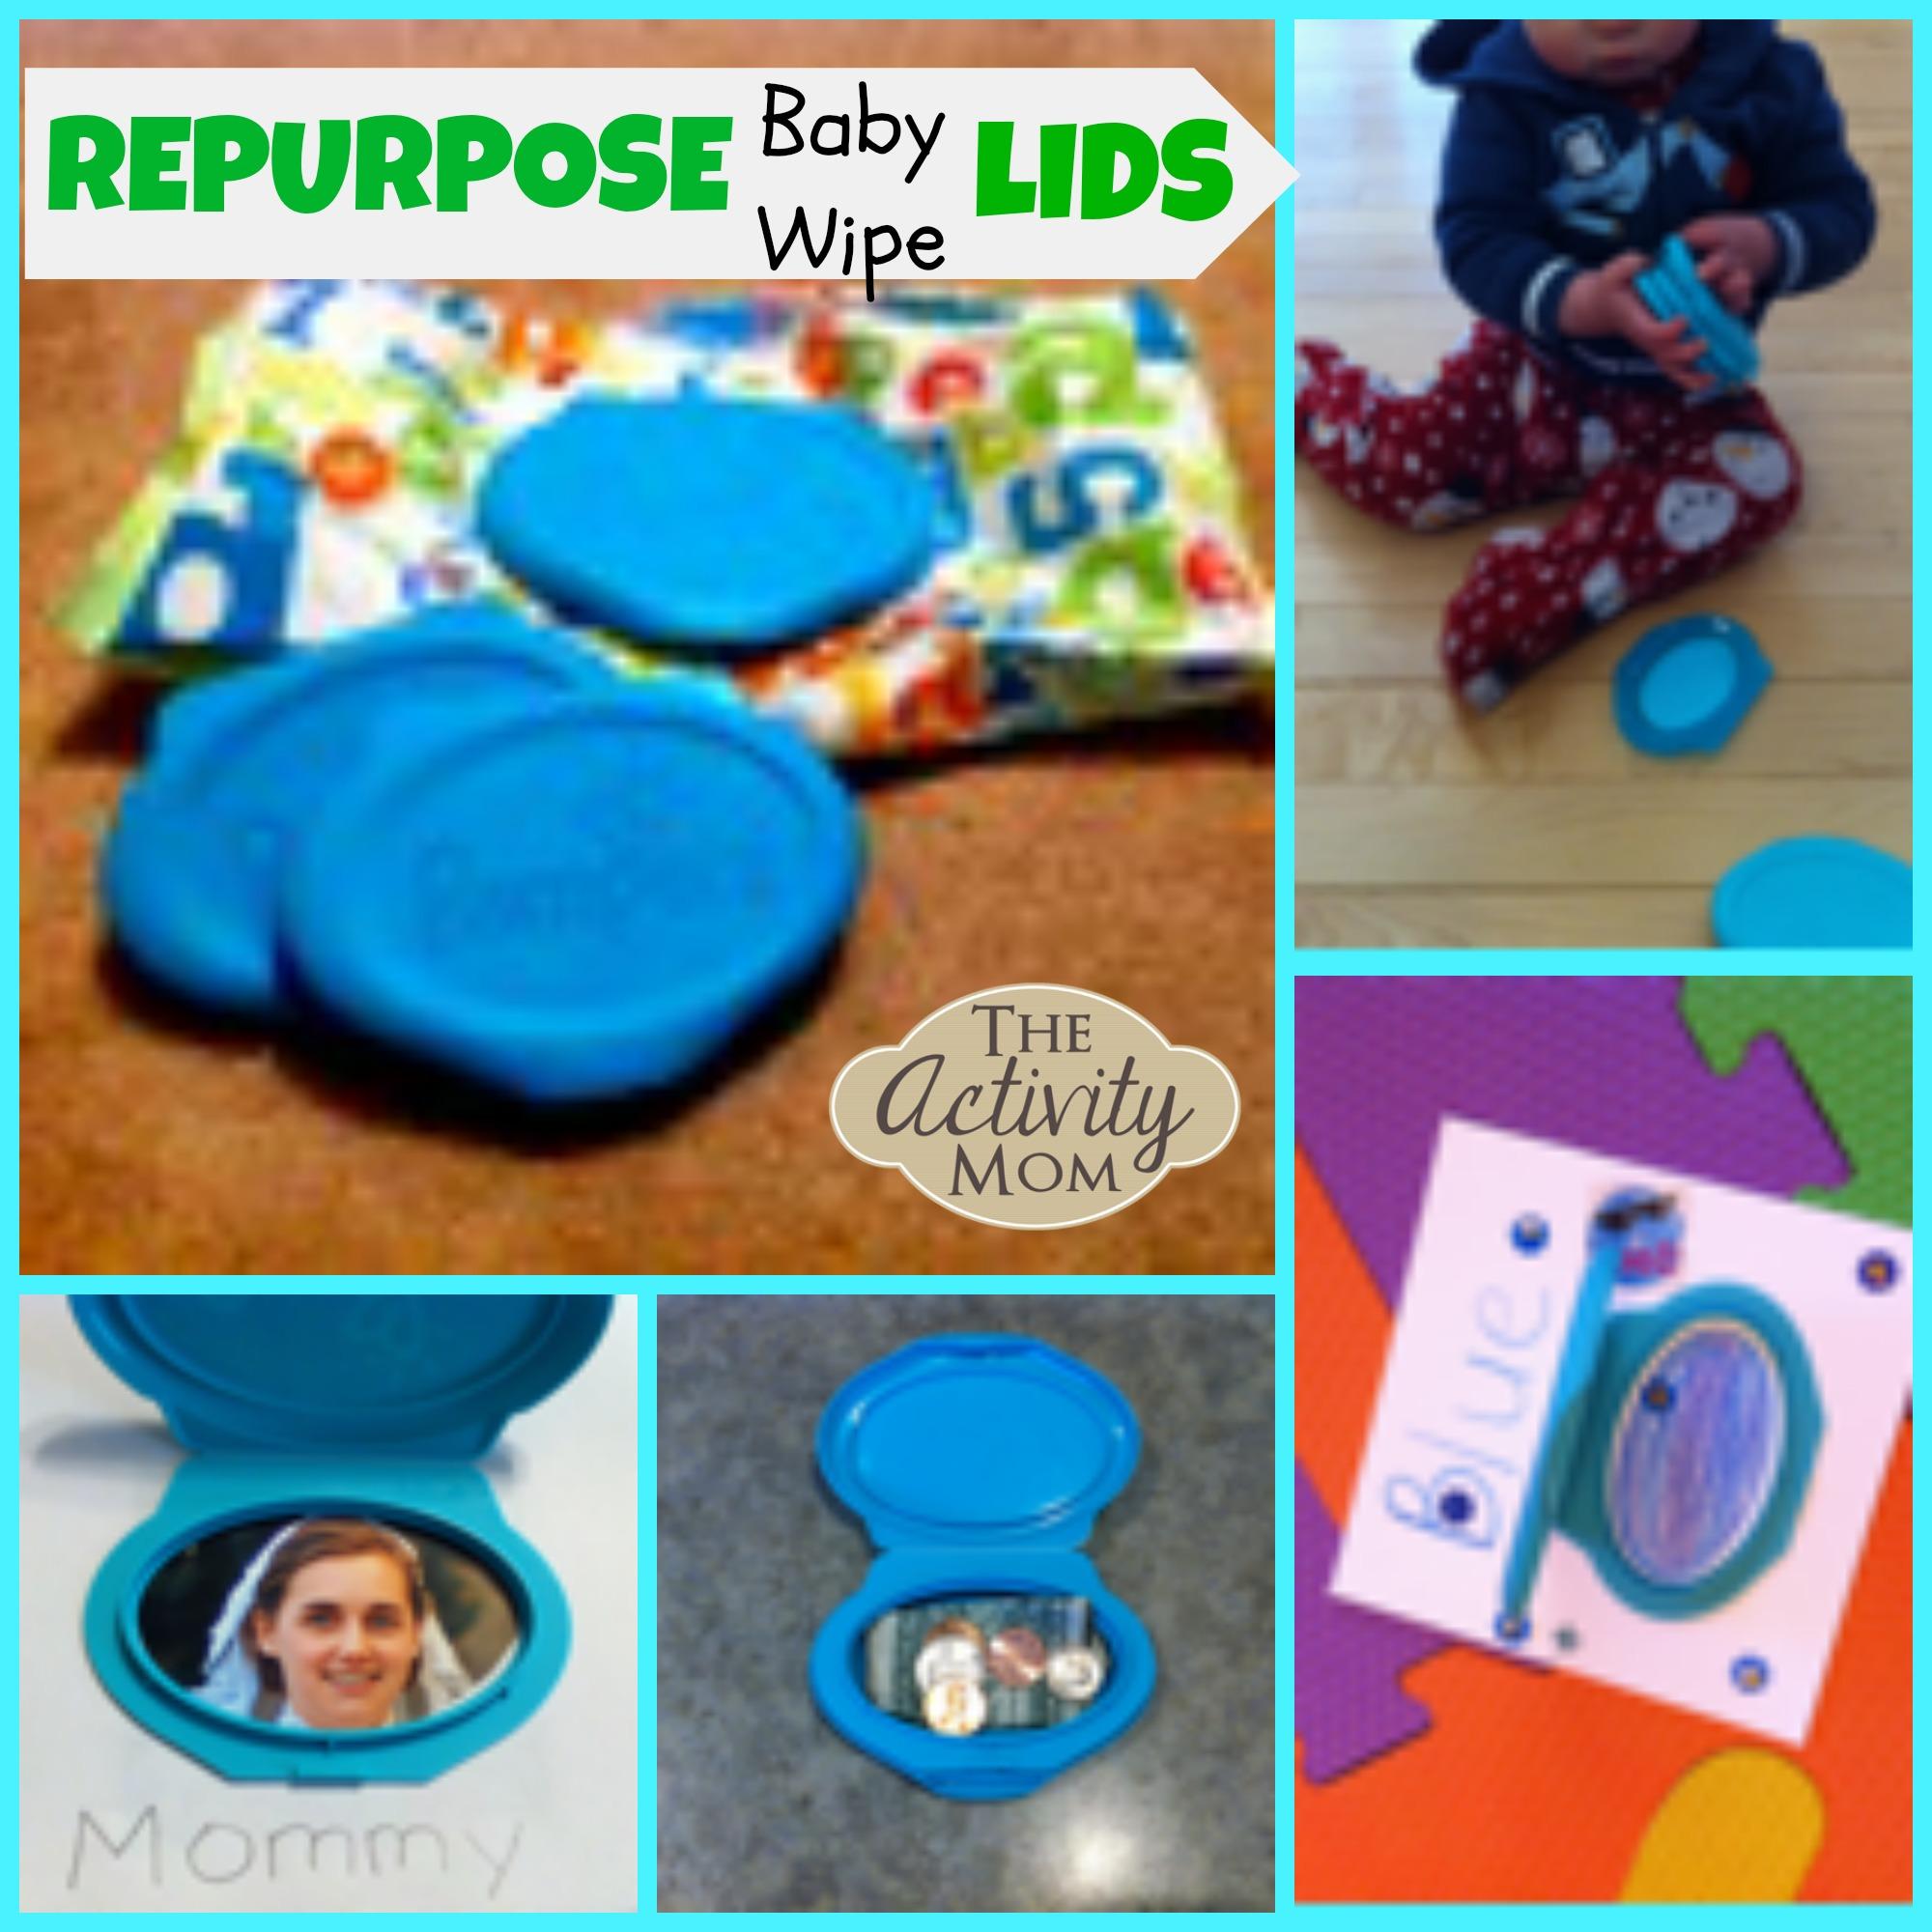 Repurpose Baby Wipe Lids